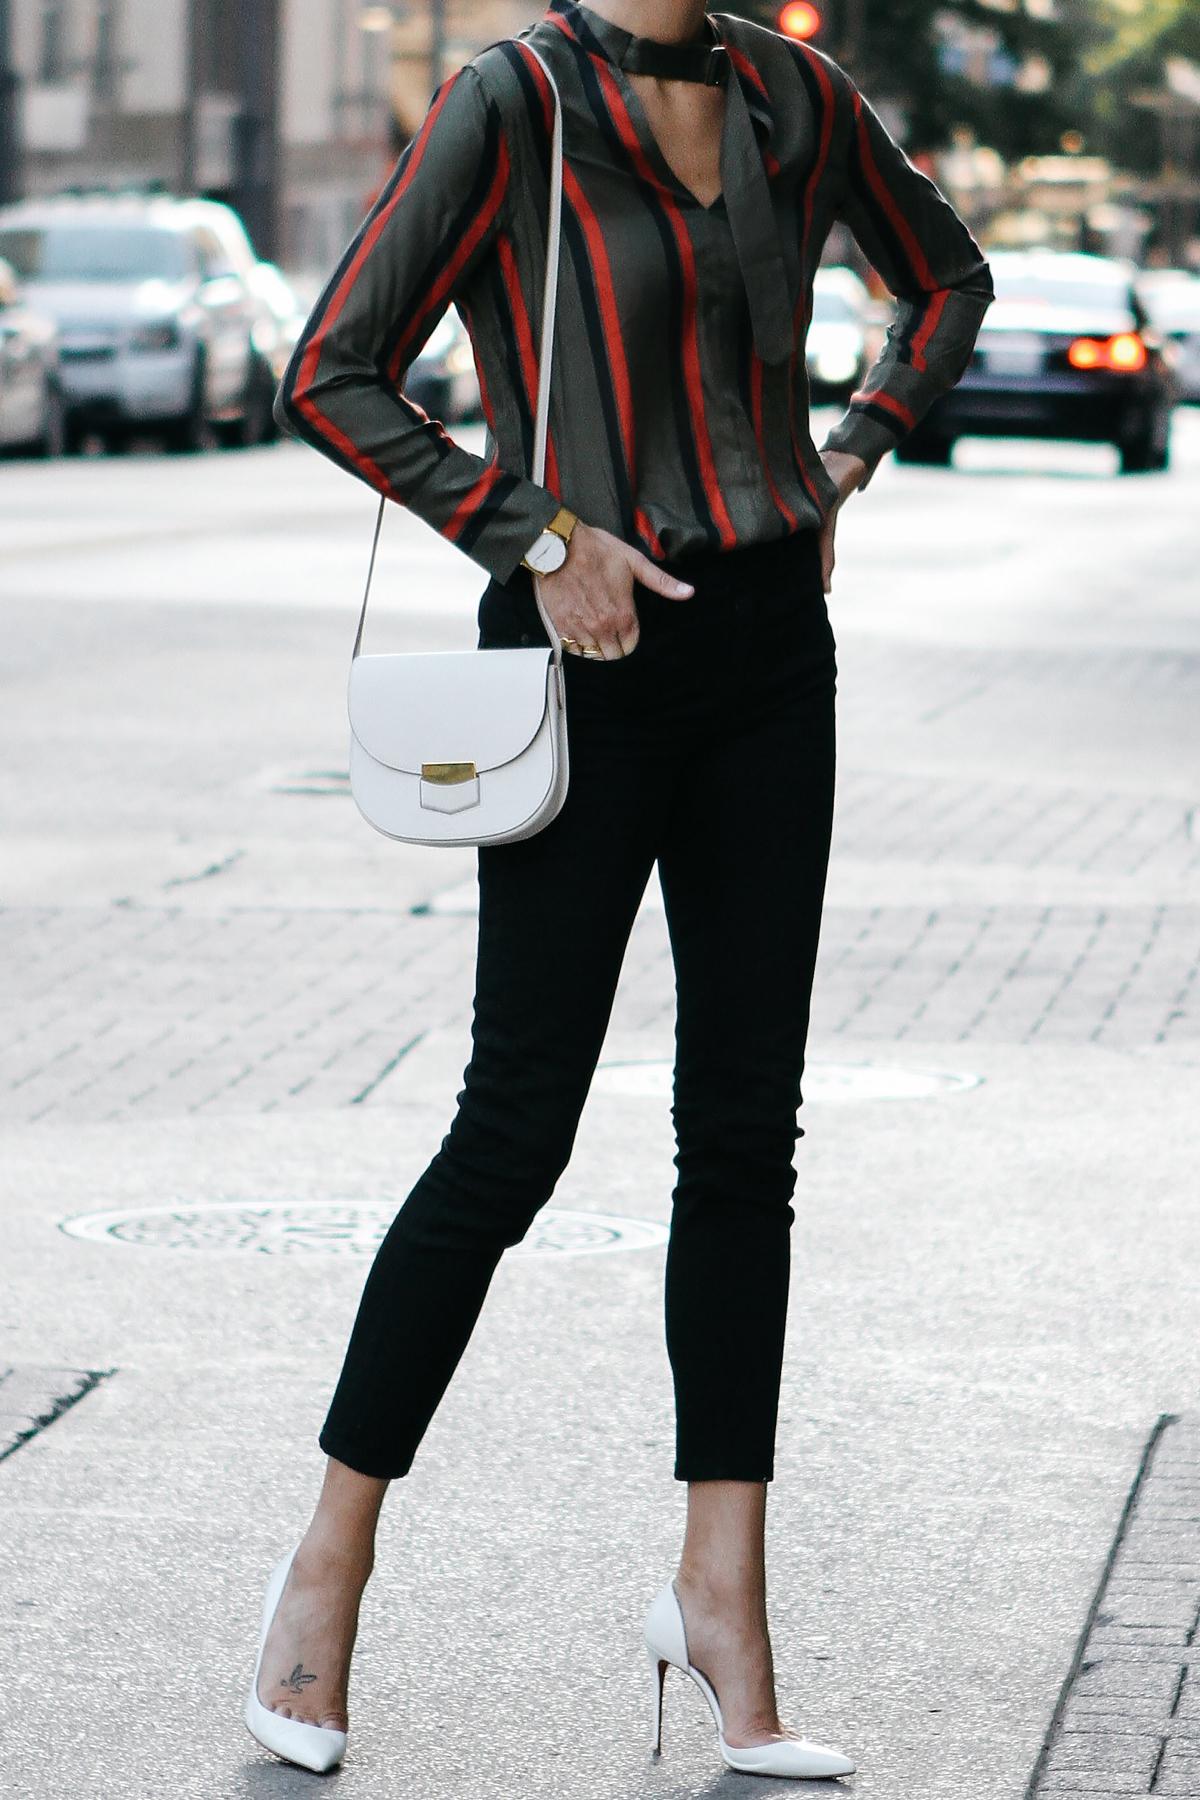 Equipment Janelle Striped Blouse Everlane Black Skinny Jeans Christian Louboutin White Pumps Celine Trotteur White Handbag Fashion Jackson Dallas Blogger Fashion Blogger Street Style